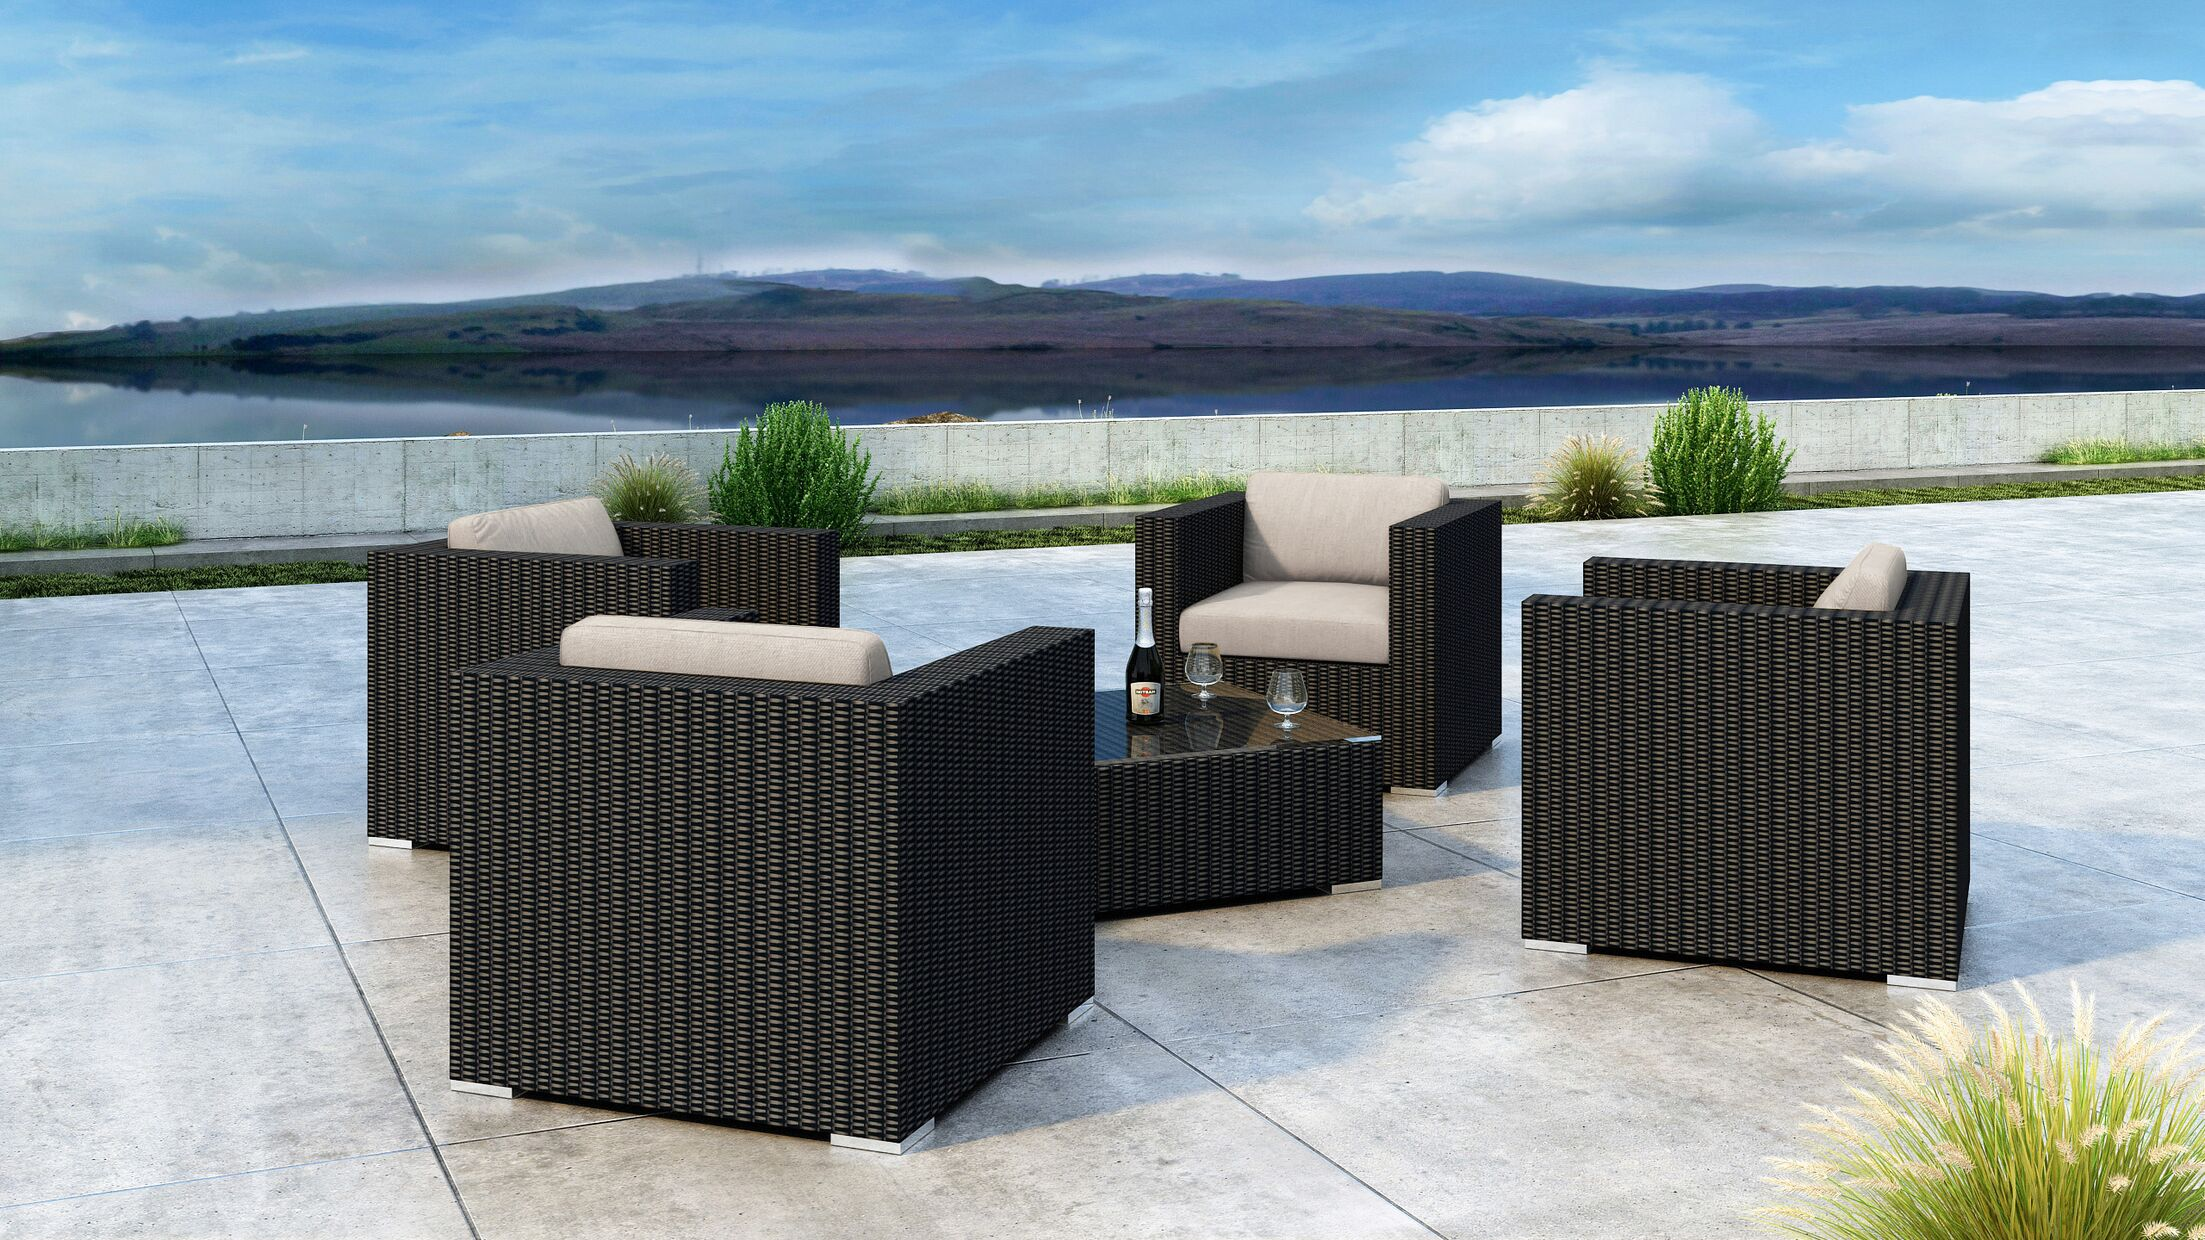 Glendale 5 Piece Sofa Set with Sunbrella Cushion Cushion Color: Canvas Flax